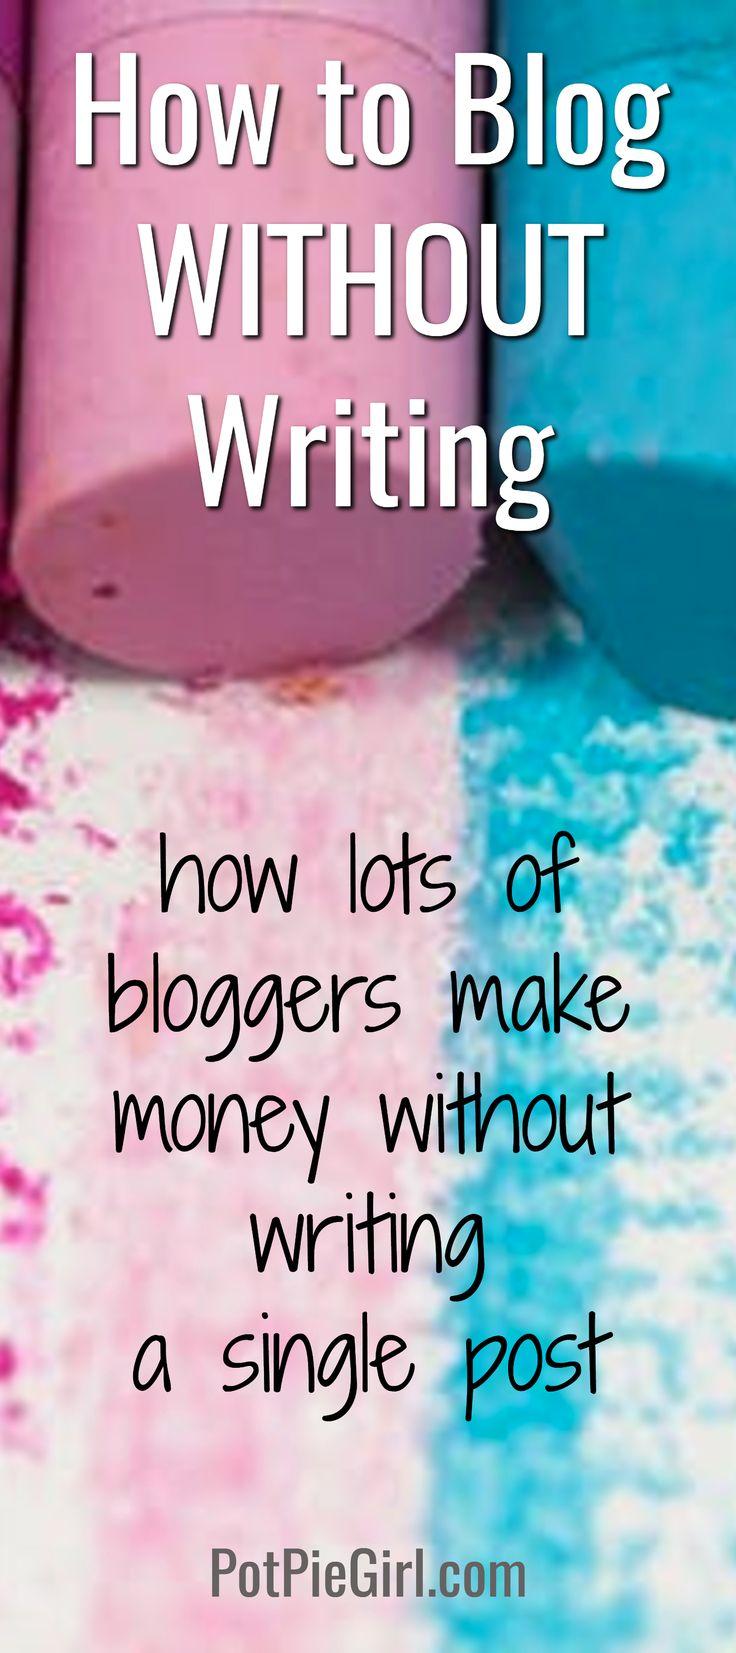 blogging tips and tricks - content marketing ideas - blog post ideas - blogging for money - make money blogging - how to blog - how to start a blog - starting a blog - blogging topics - blogging ideas